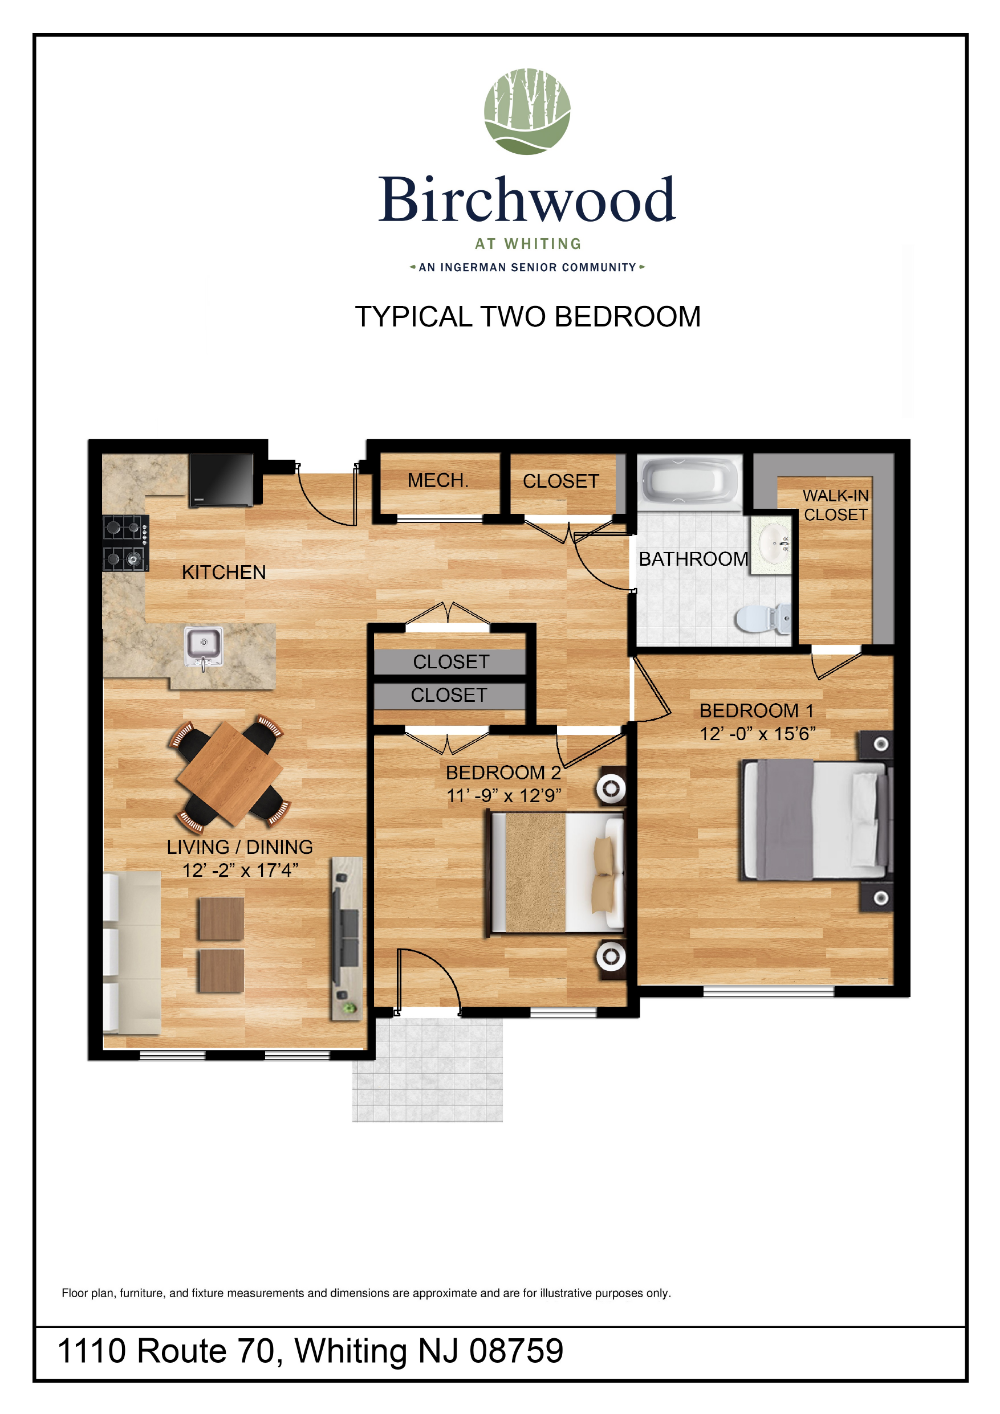 Birchwood At Whiting Senior Living In Whiting Nj After55 Com Birchwood Housing Options Senior Living